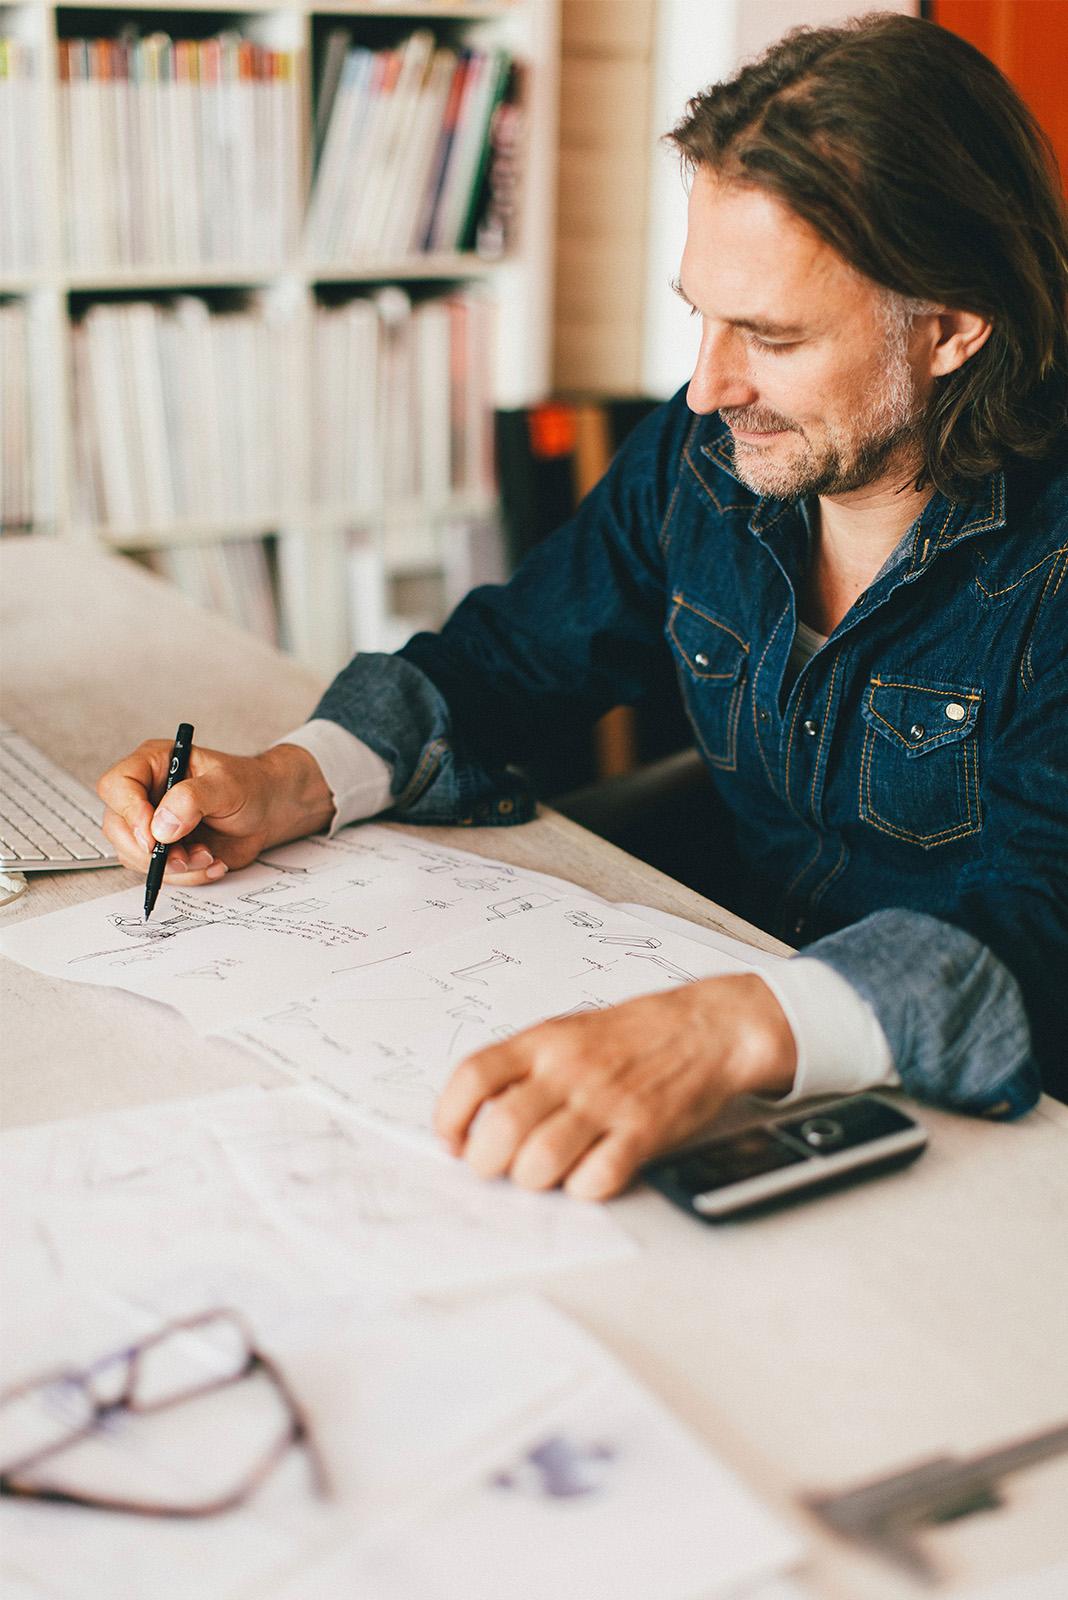 Designer Wunderblau Jochen Schmiddem